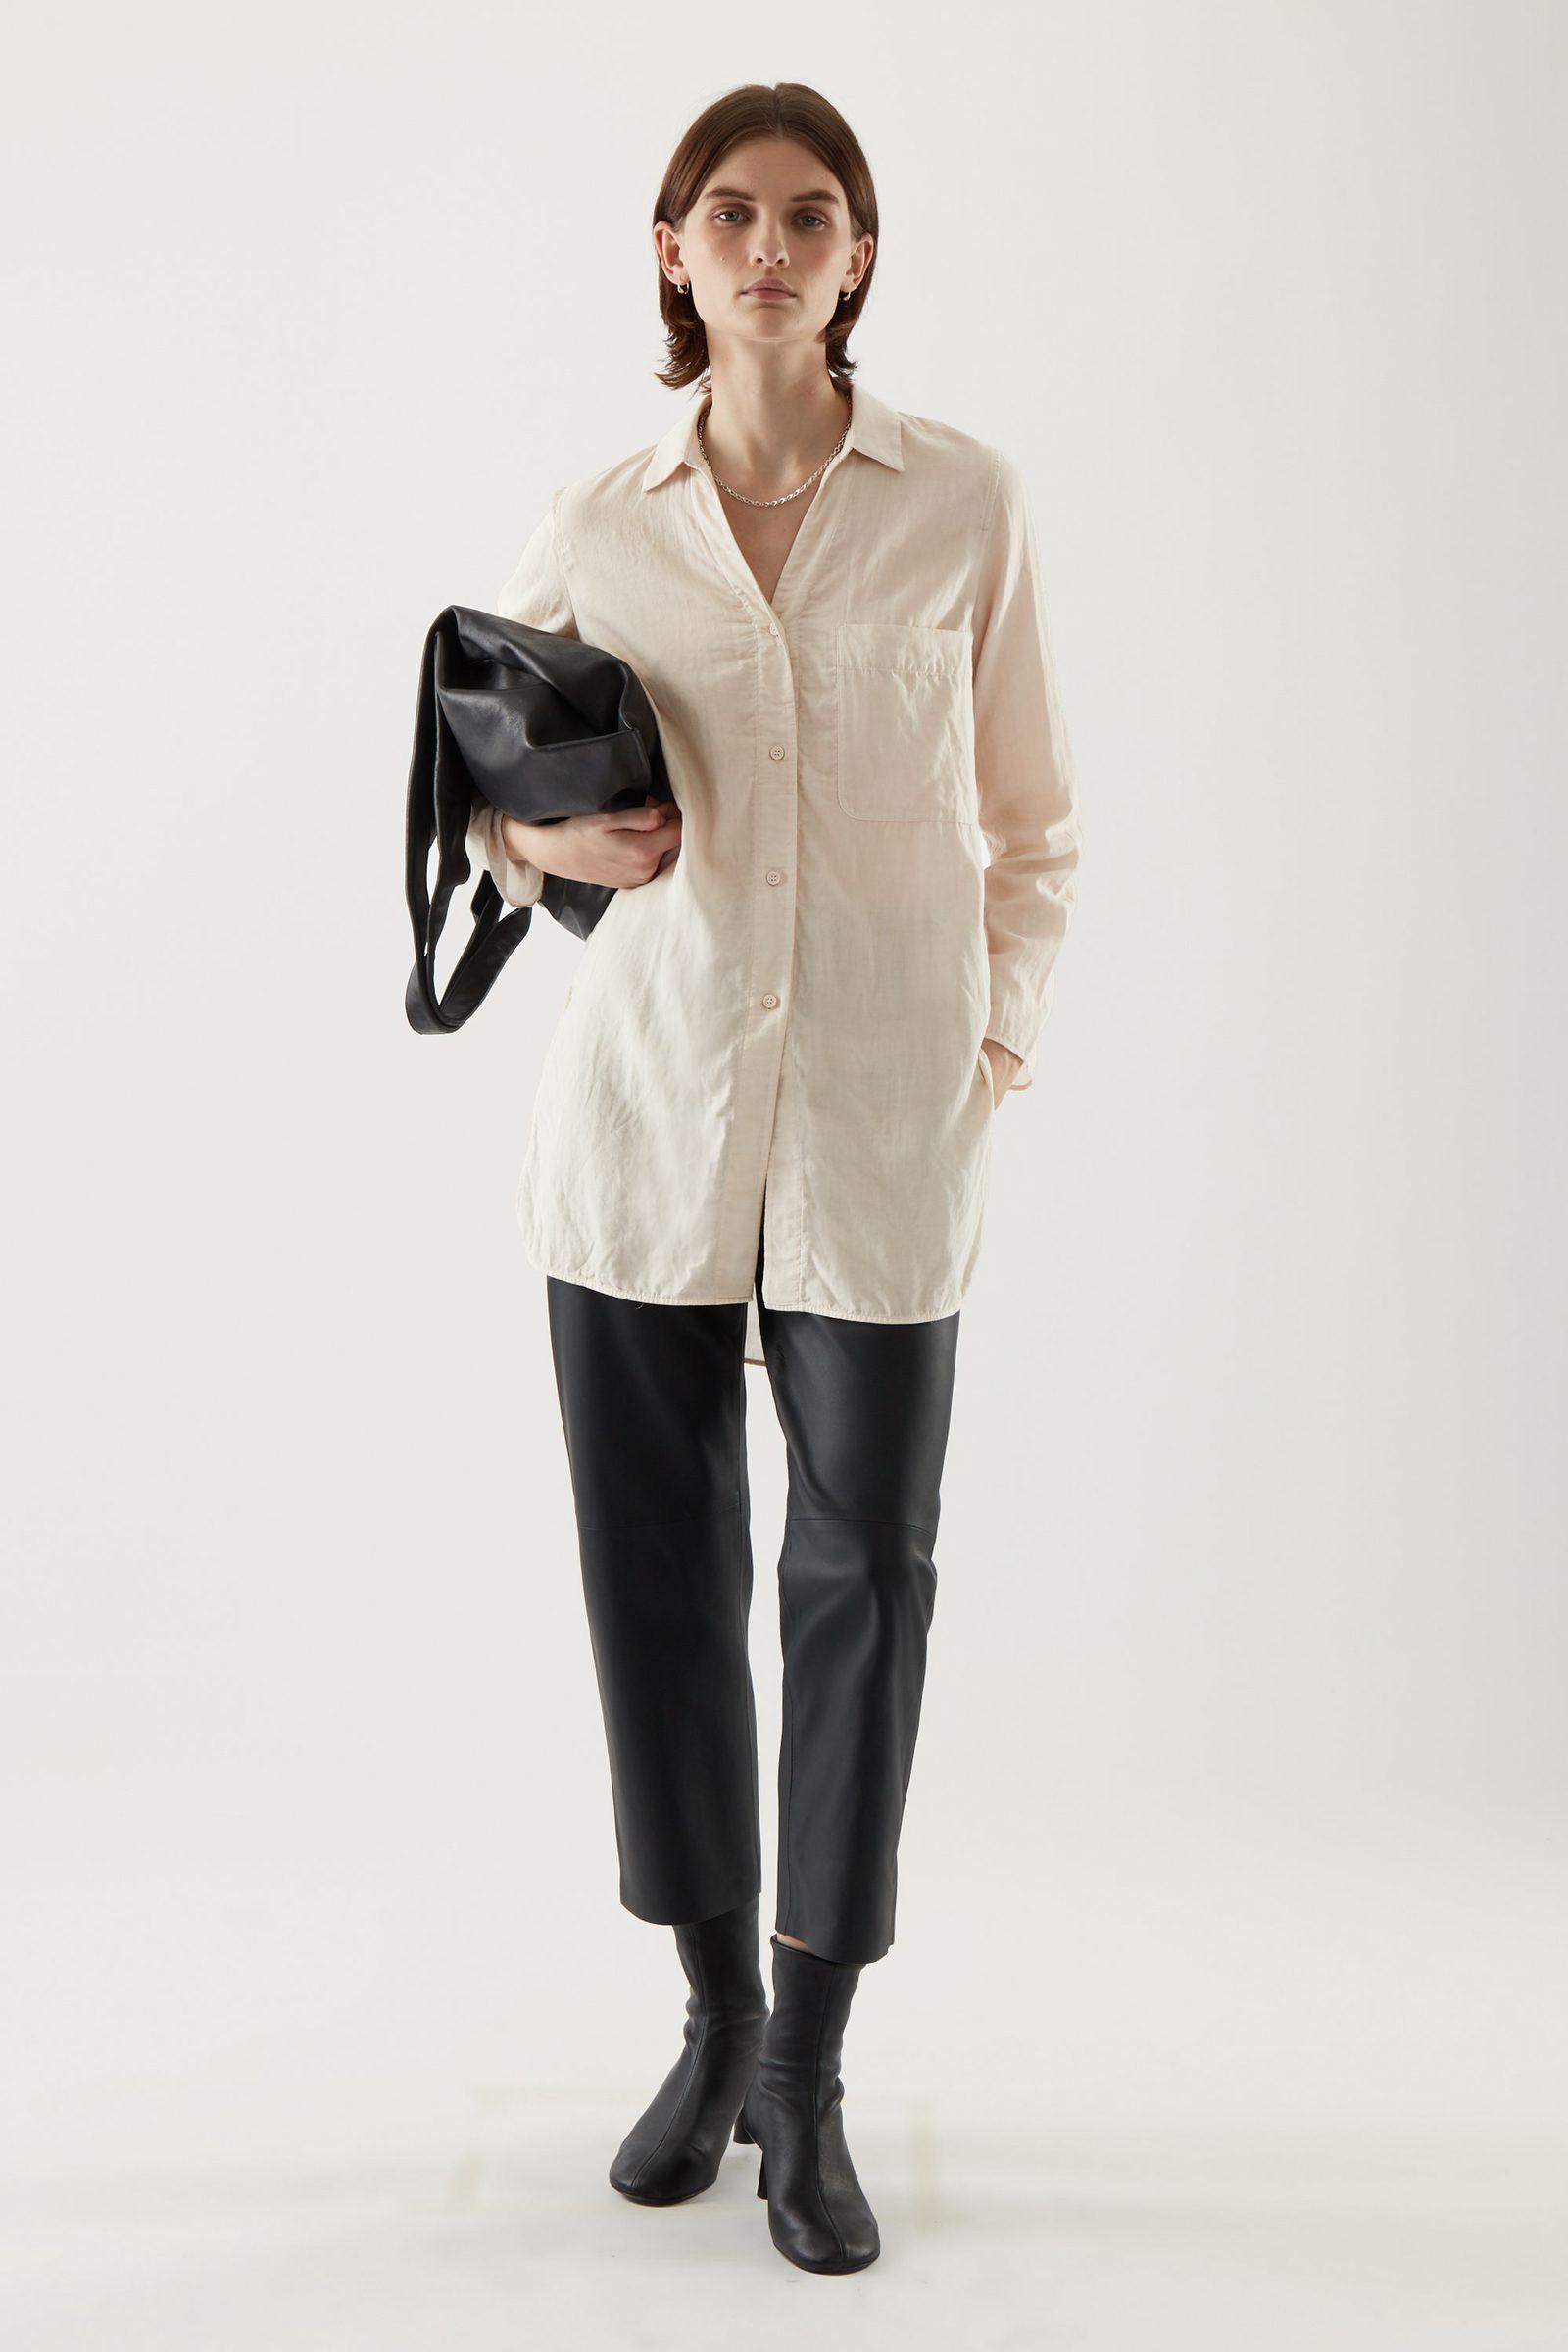 COS 오가닉 코튼 오버사이즈 튜닉 스타일 셔츠의 베이지컬러 ECOMLook입니다.